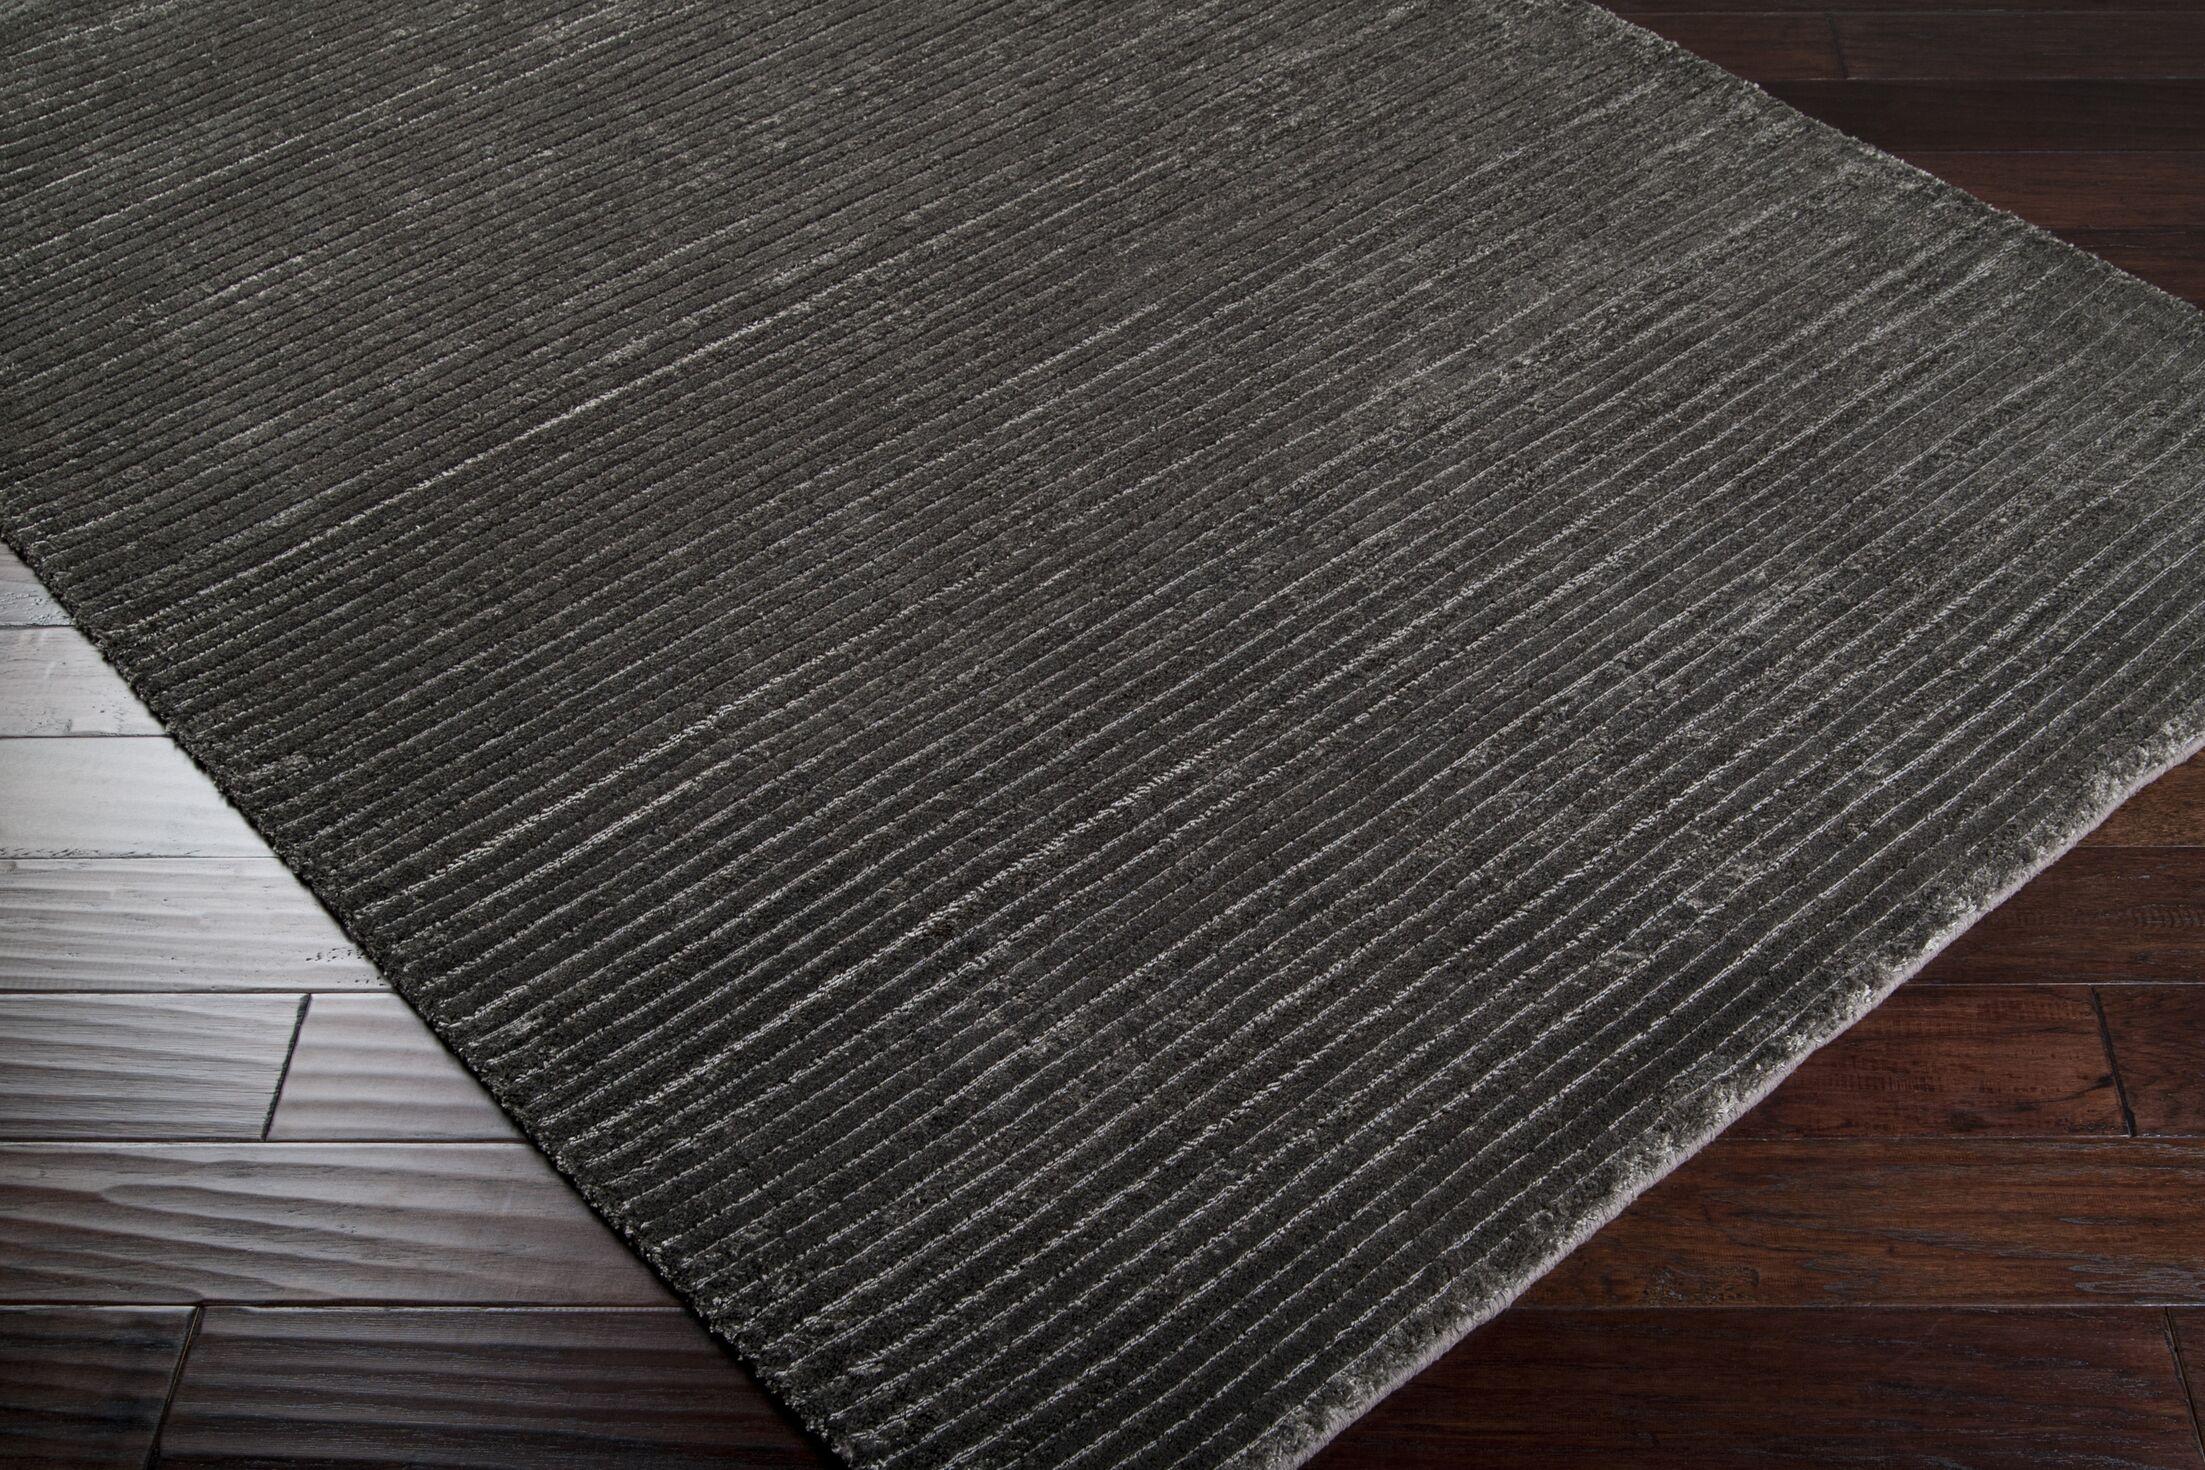 Ernestine Hand-Woven Gray Area Rug Rug Size: Rectangle 5' x 8'